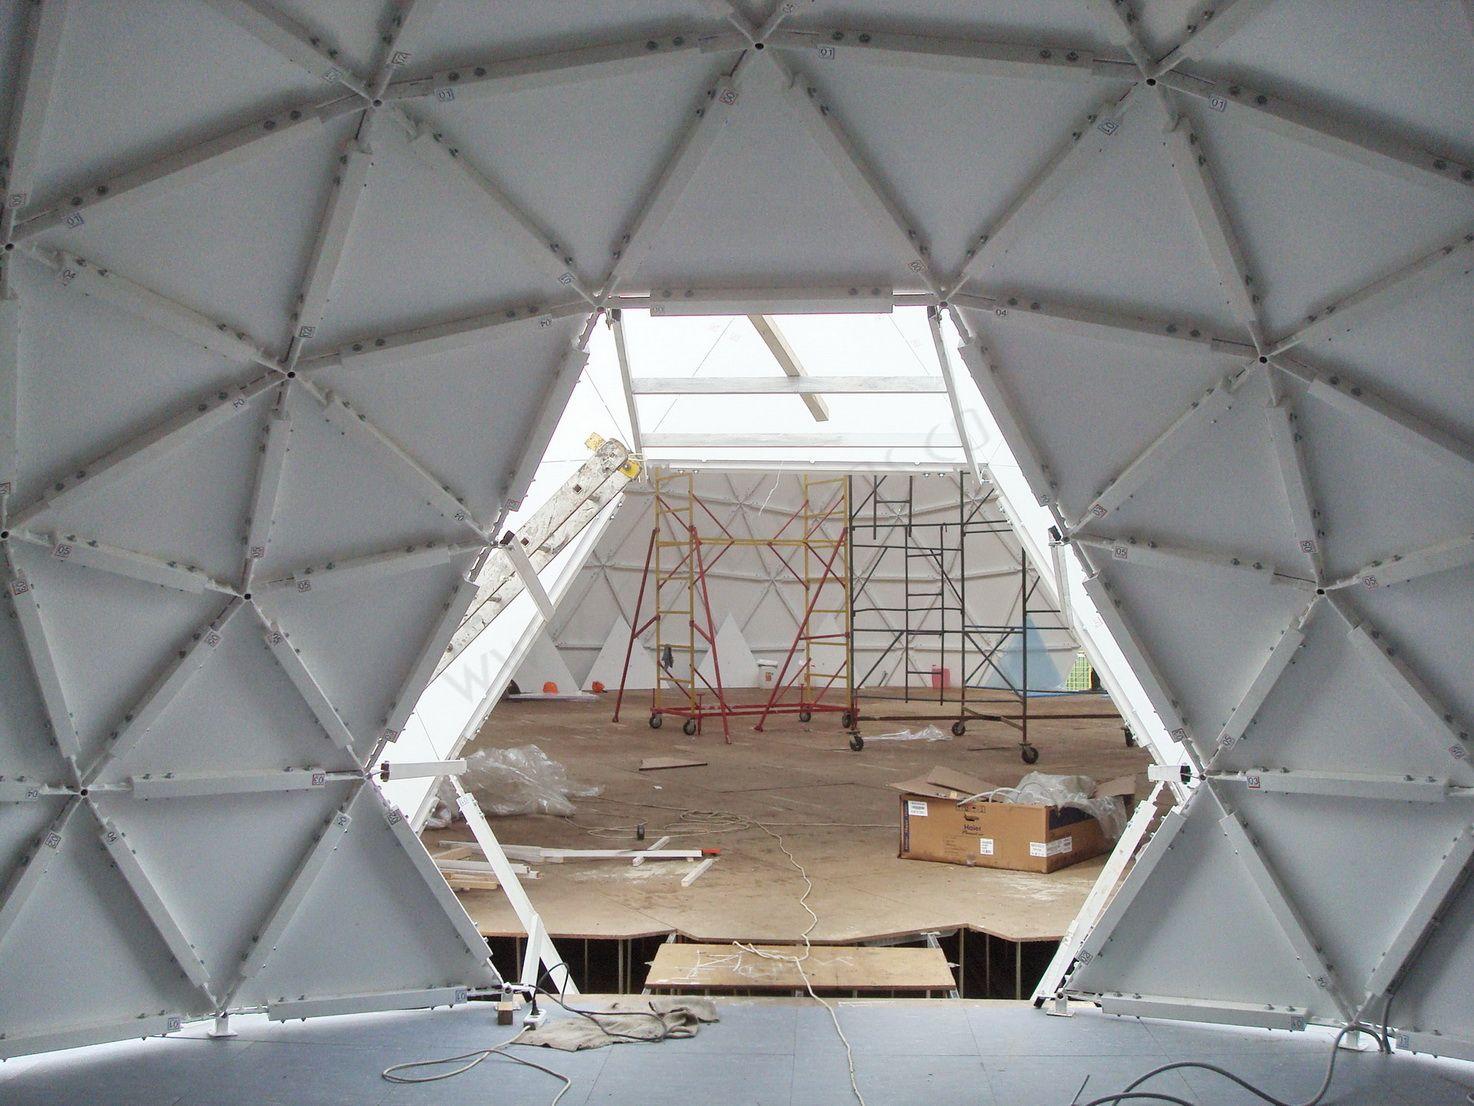 All Season VO3DUX Event Club | Geodesic Domes Ø20m & Ø6m